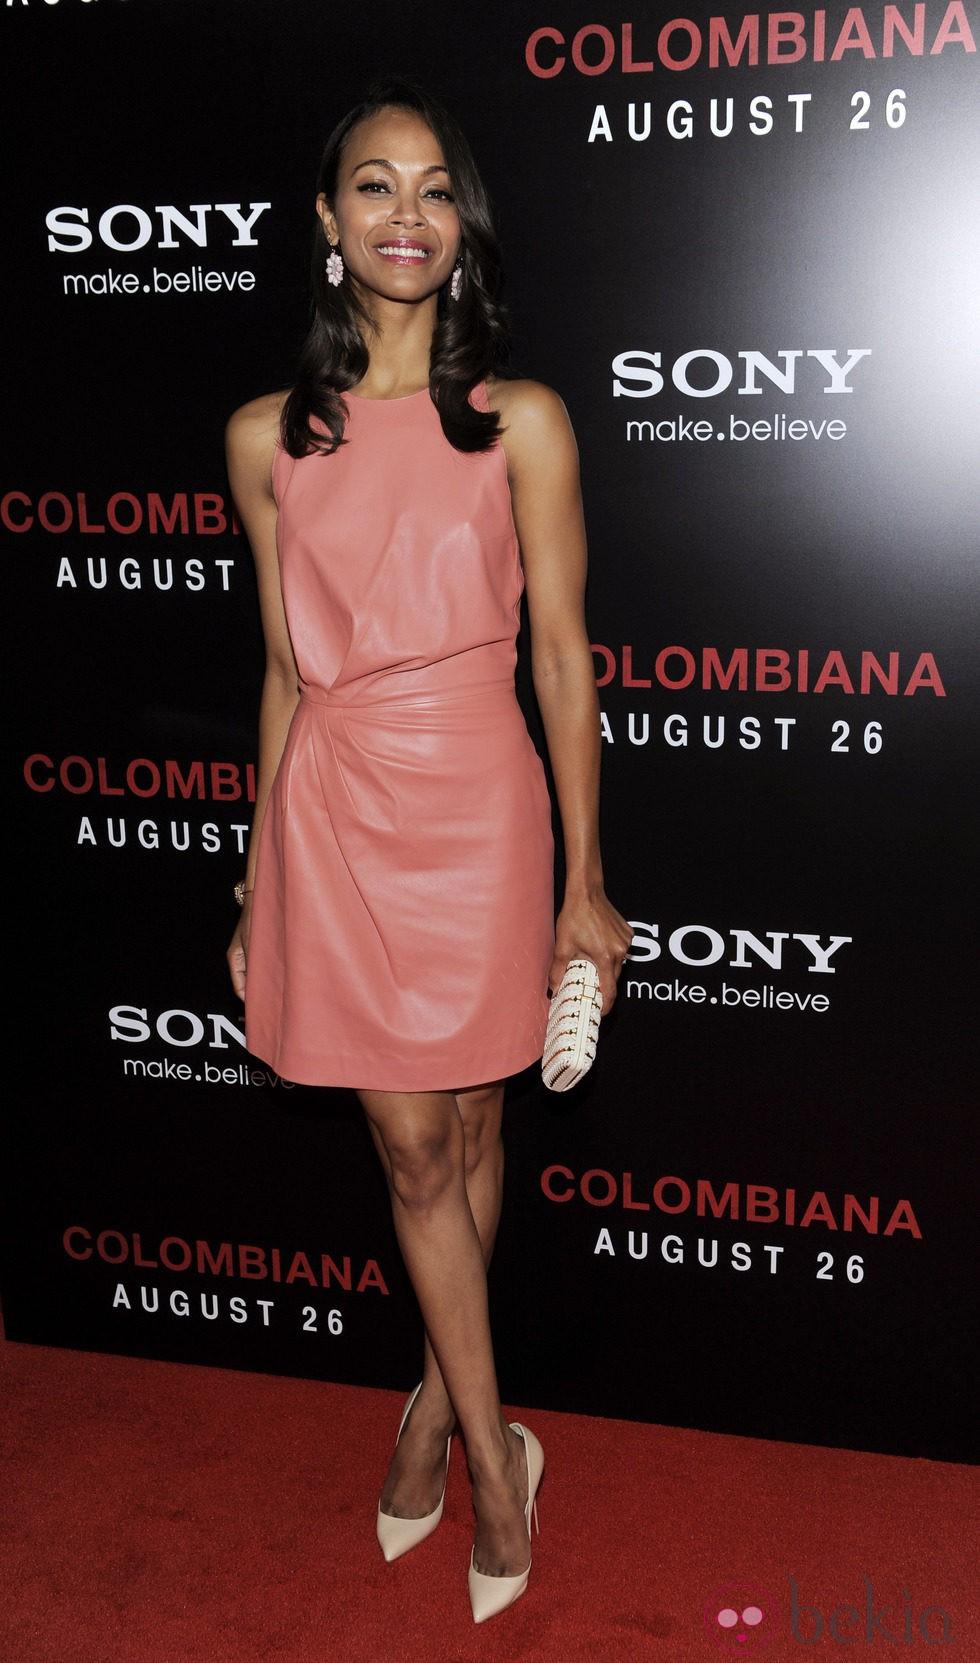 Zoe Saldana presenta 'Colombiana' de Valentino